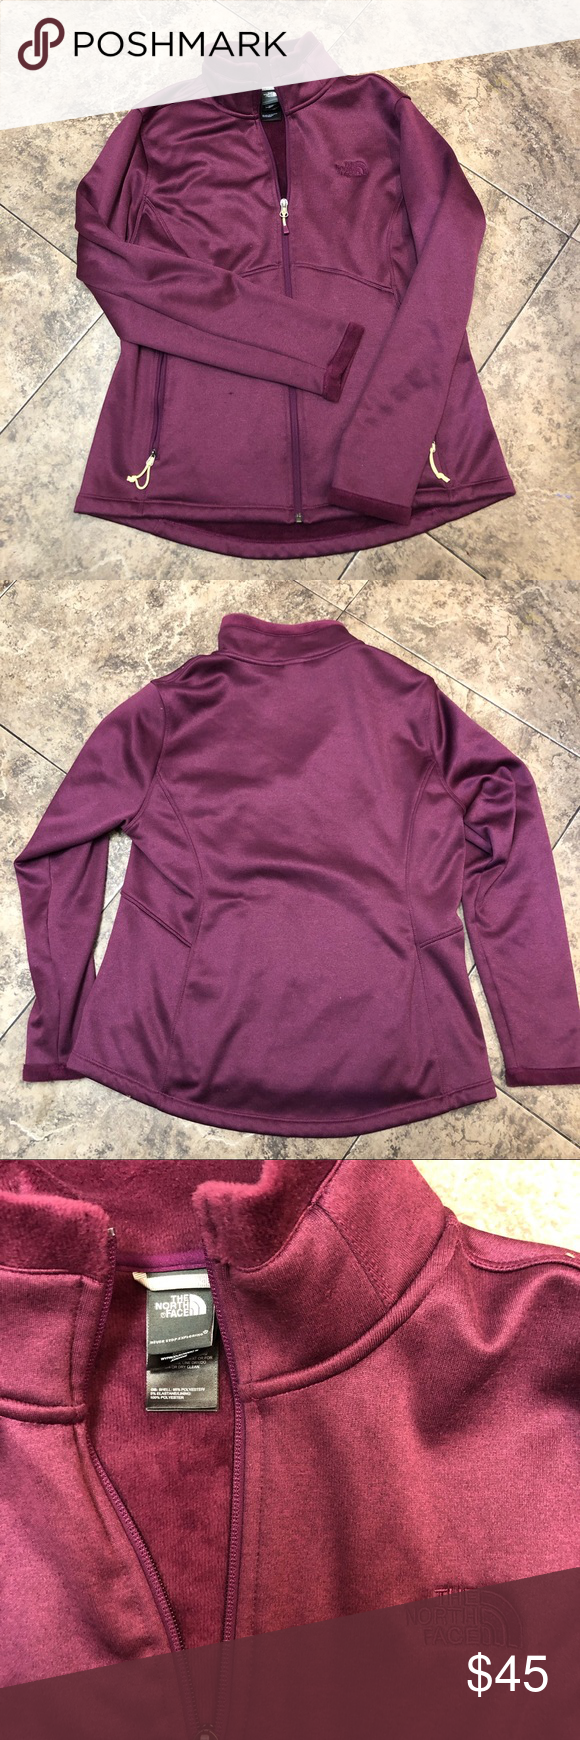 Maroon Plum North Face Zip Up Zip Ups North Face Jacket Clothes Design [ 1740 x 580 Pixel ]